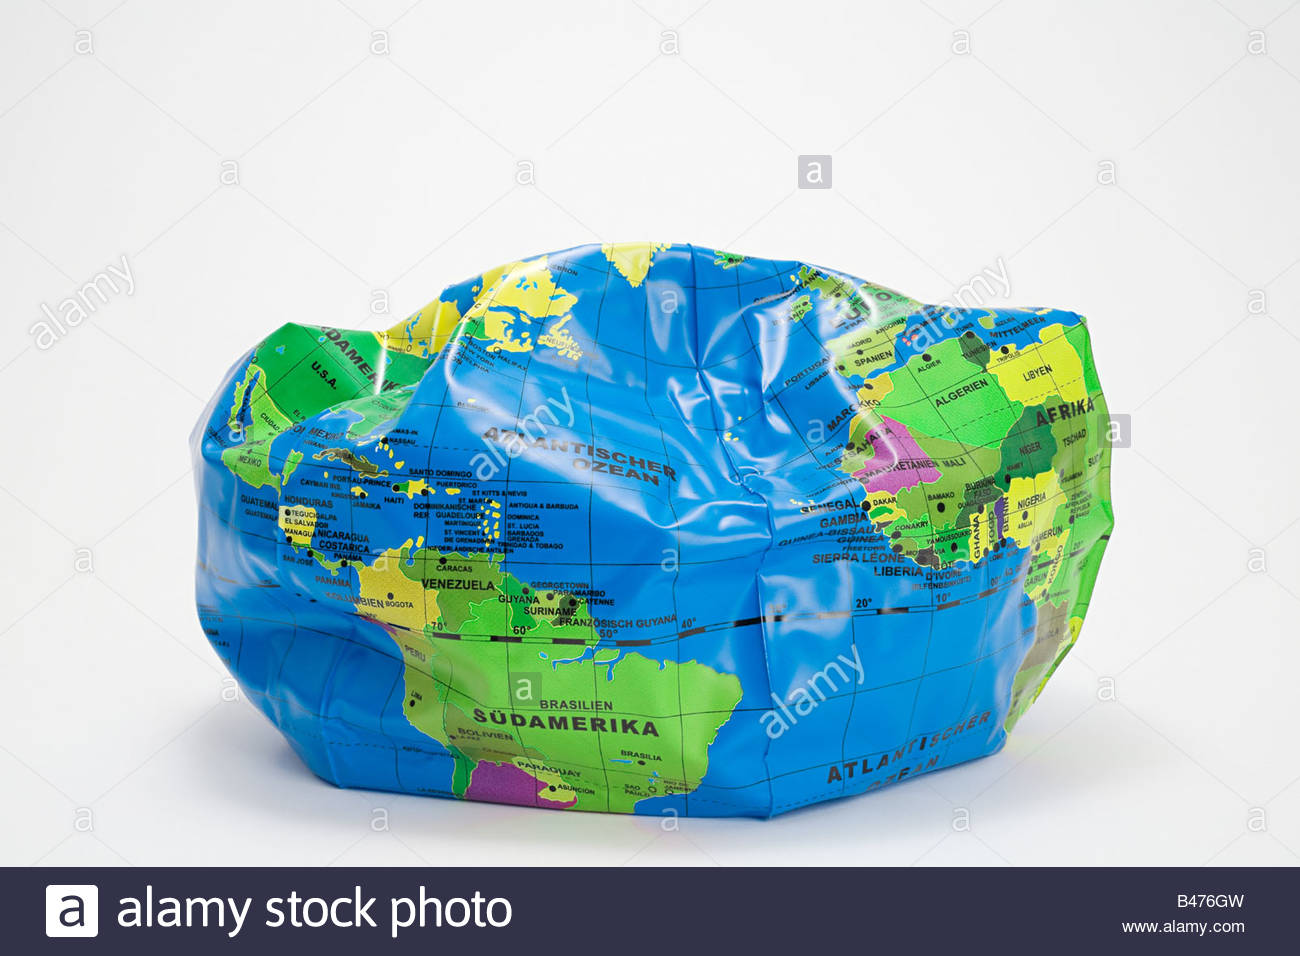 A deflated globe beach ball - Stock Image